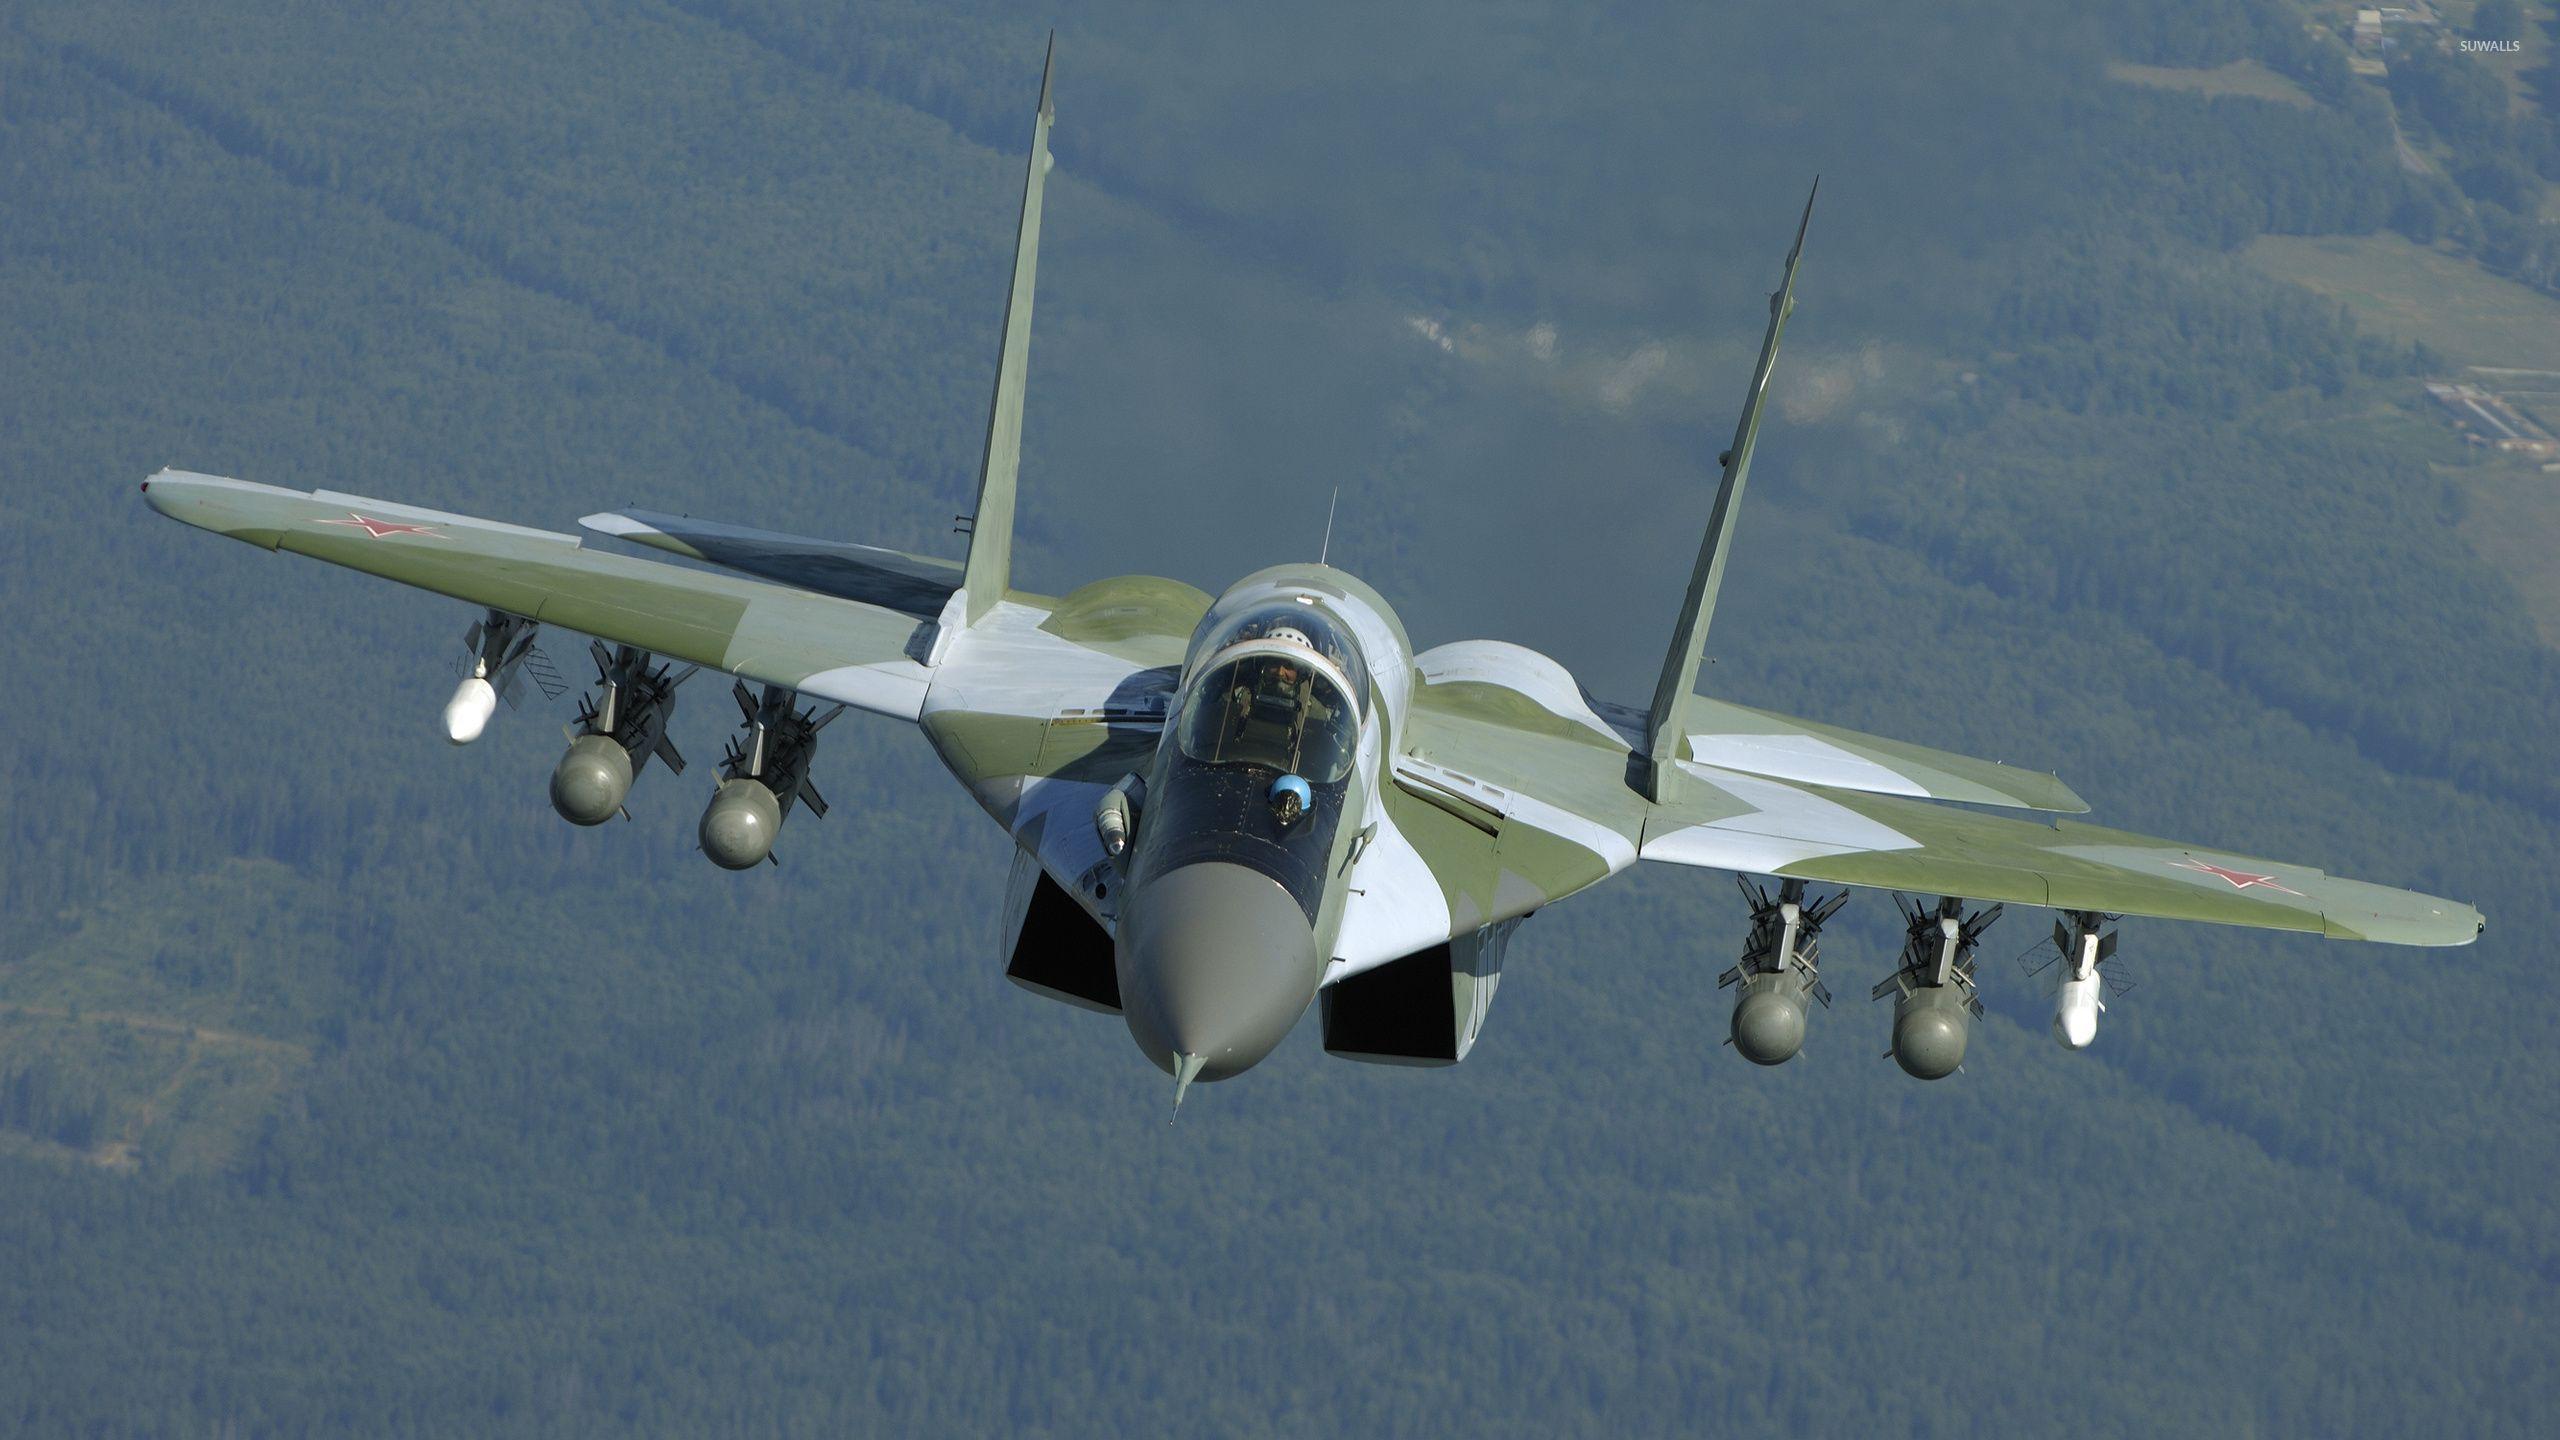 Mikoyan Mig 31 Taking Off Wallpaper Aircraft Wallpapers 52574